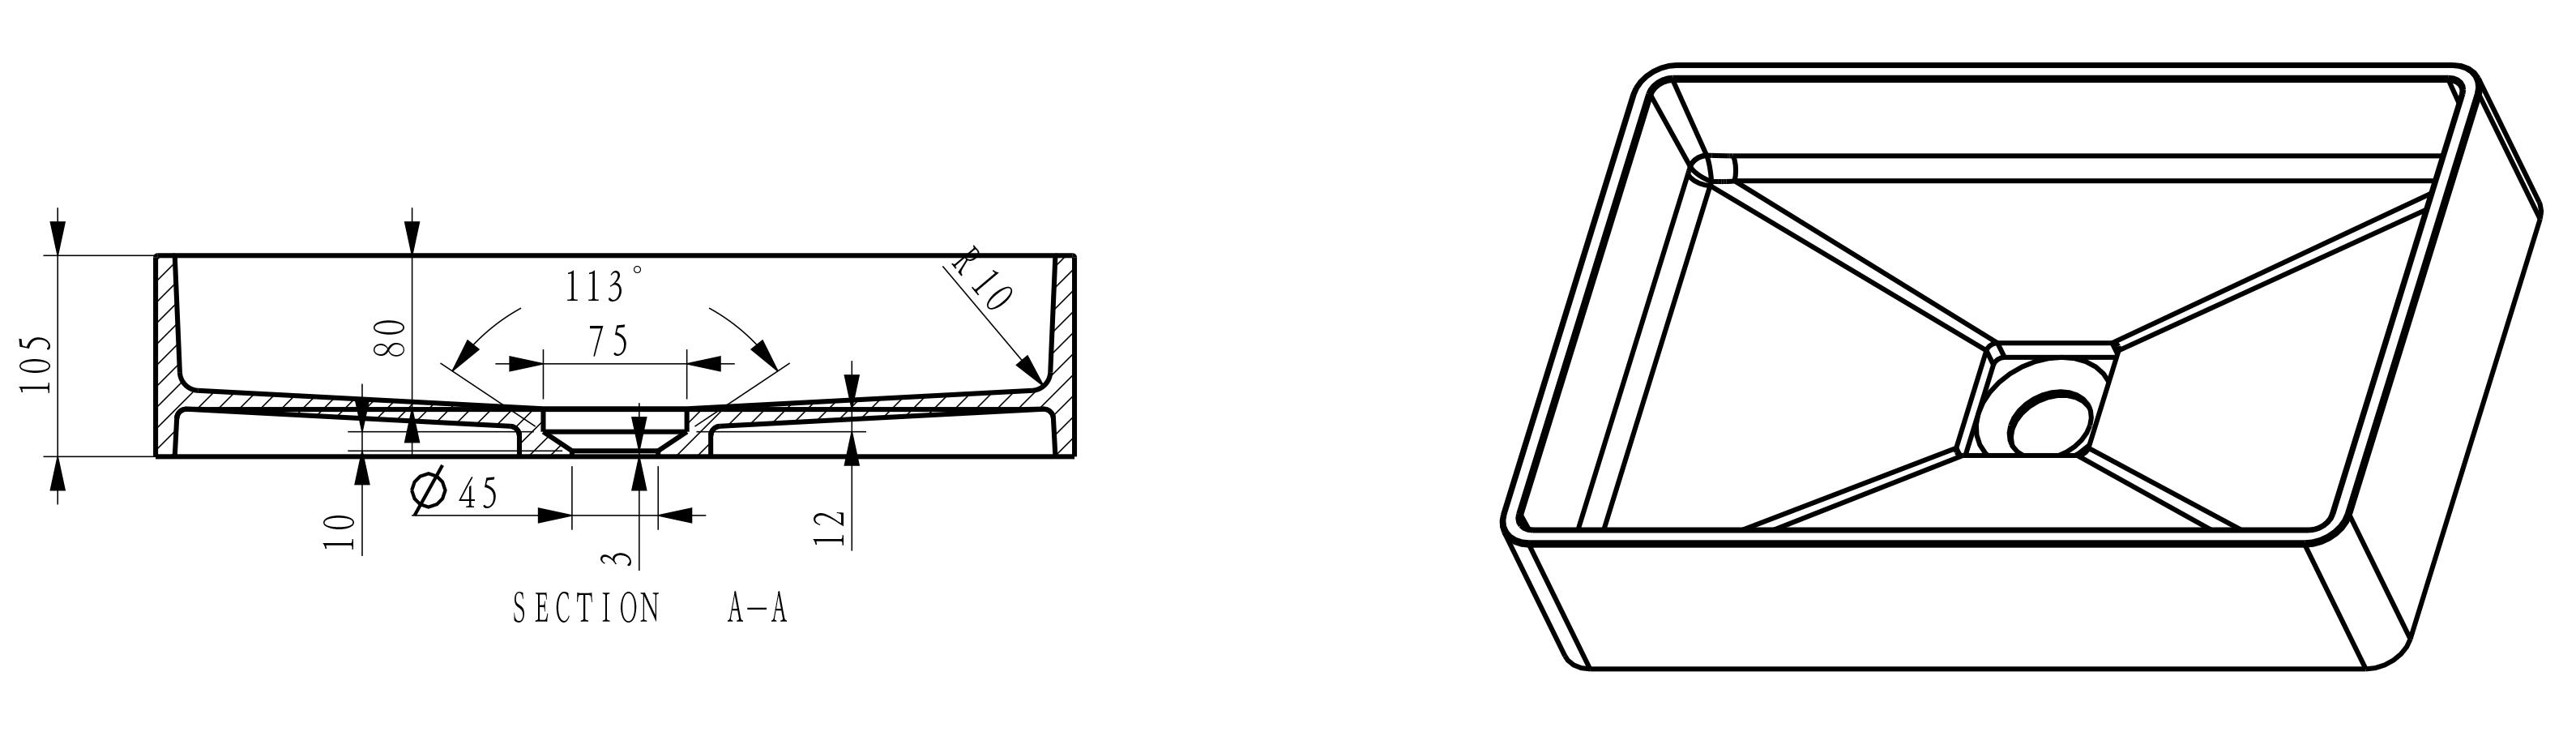 Countertop washbasin PB2011B - Drawing 2